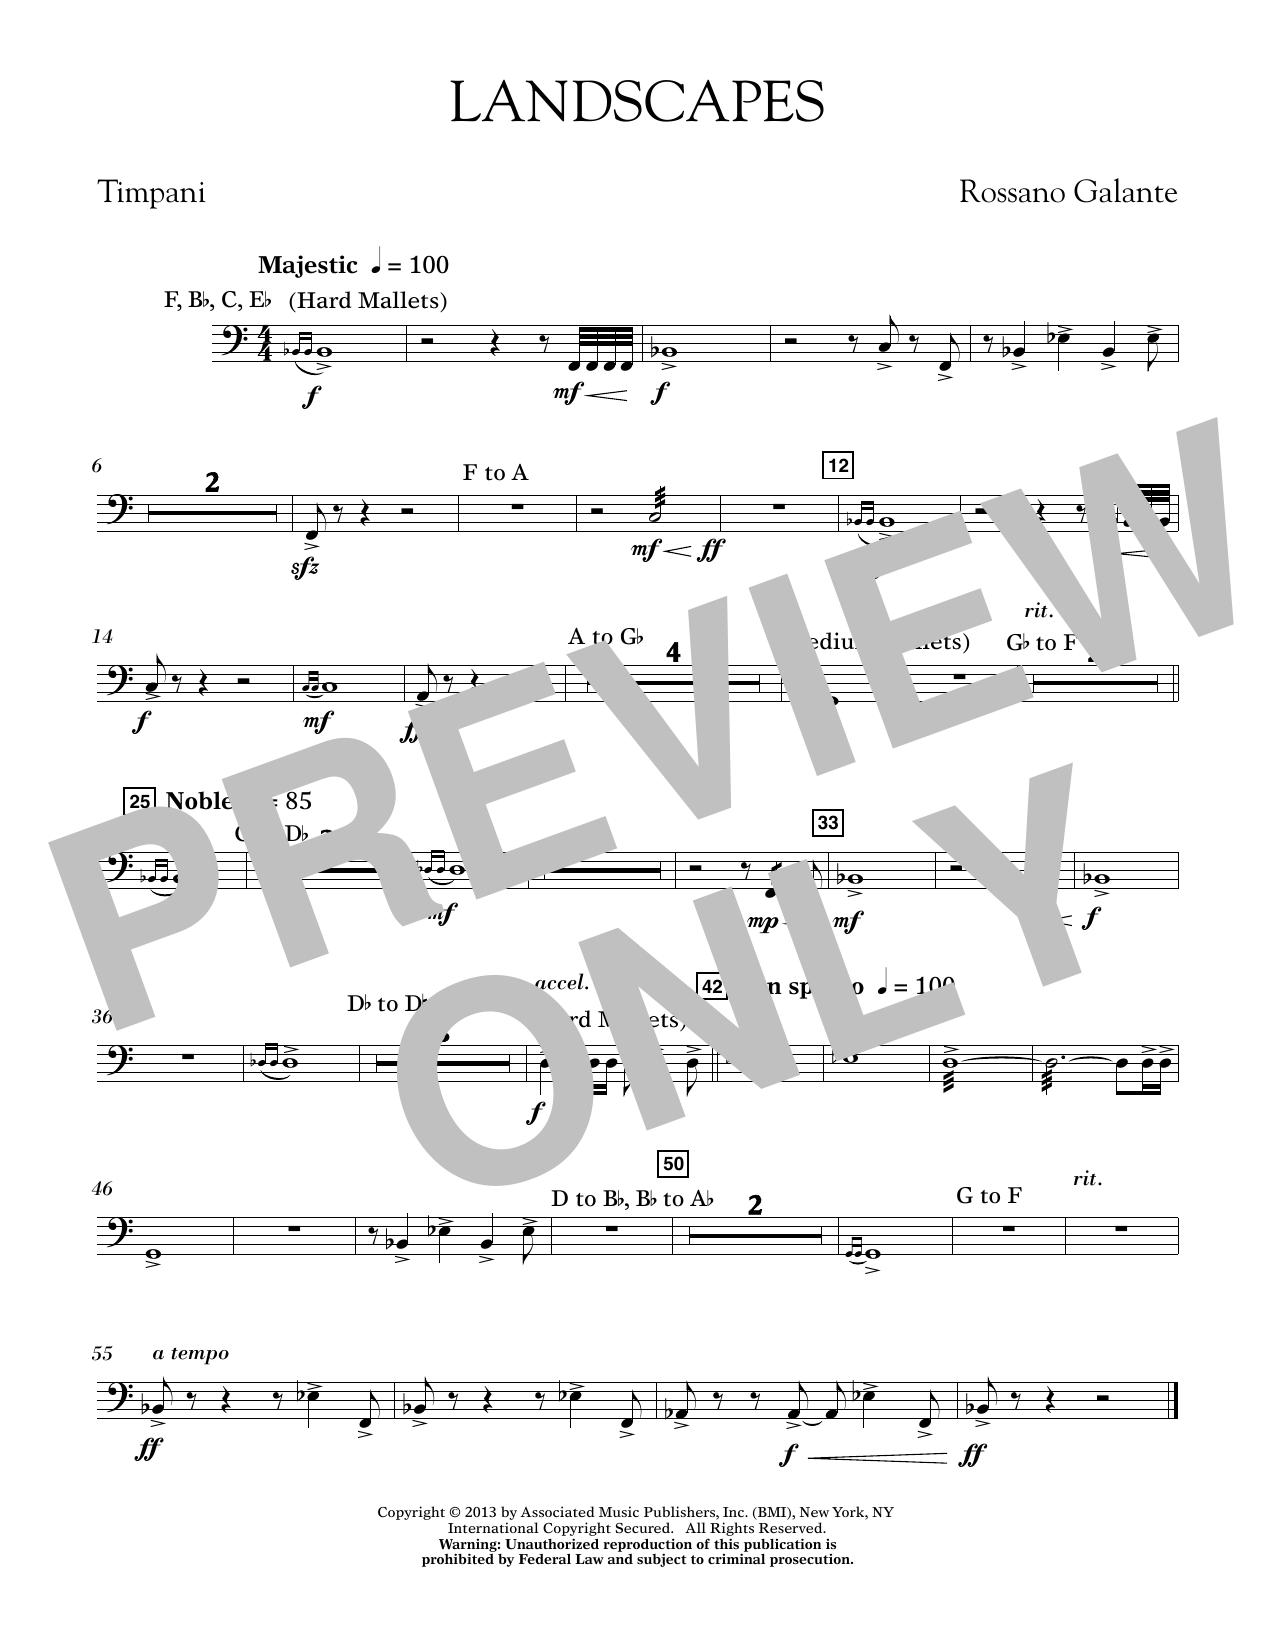 Rosanno Galante Landscapes - Timpani sheet music notes printable PDF score